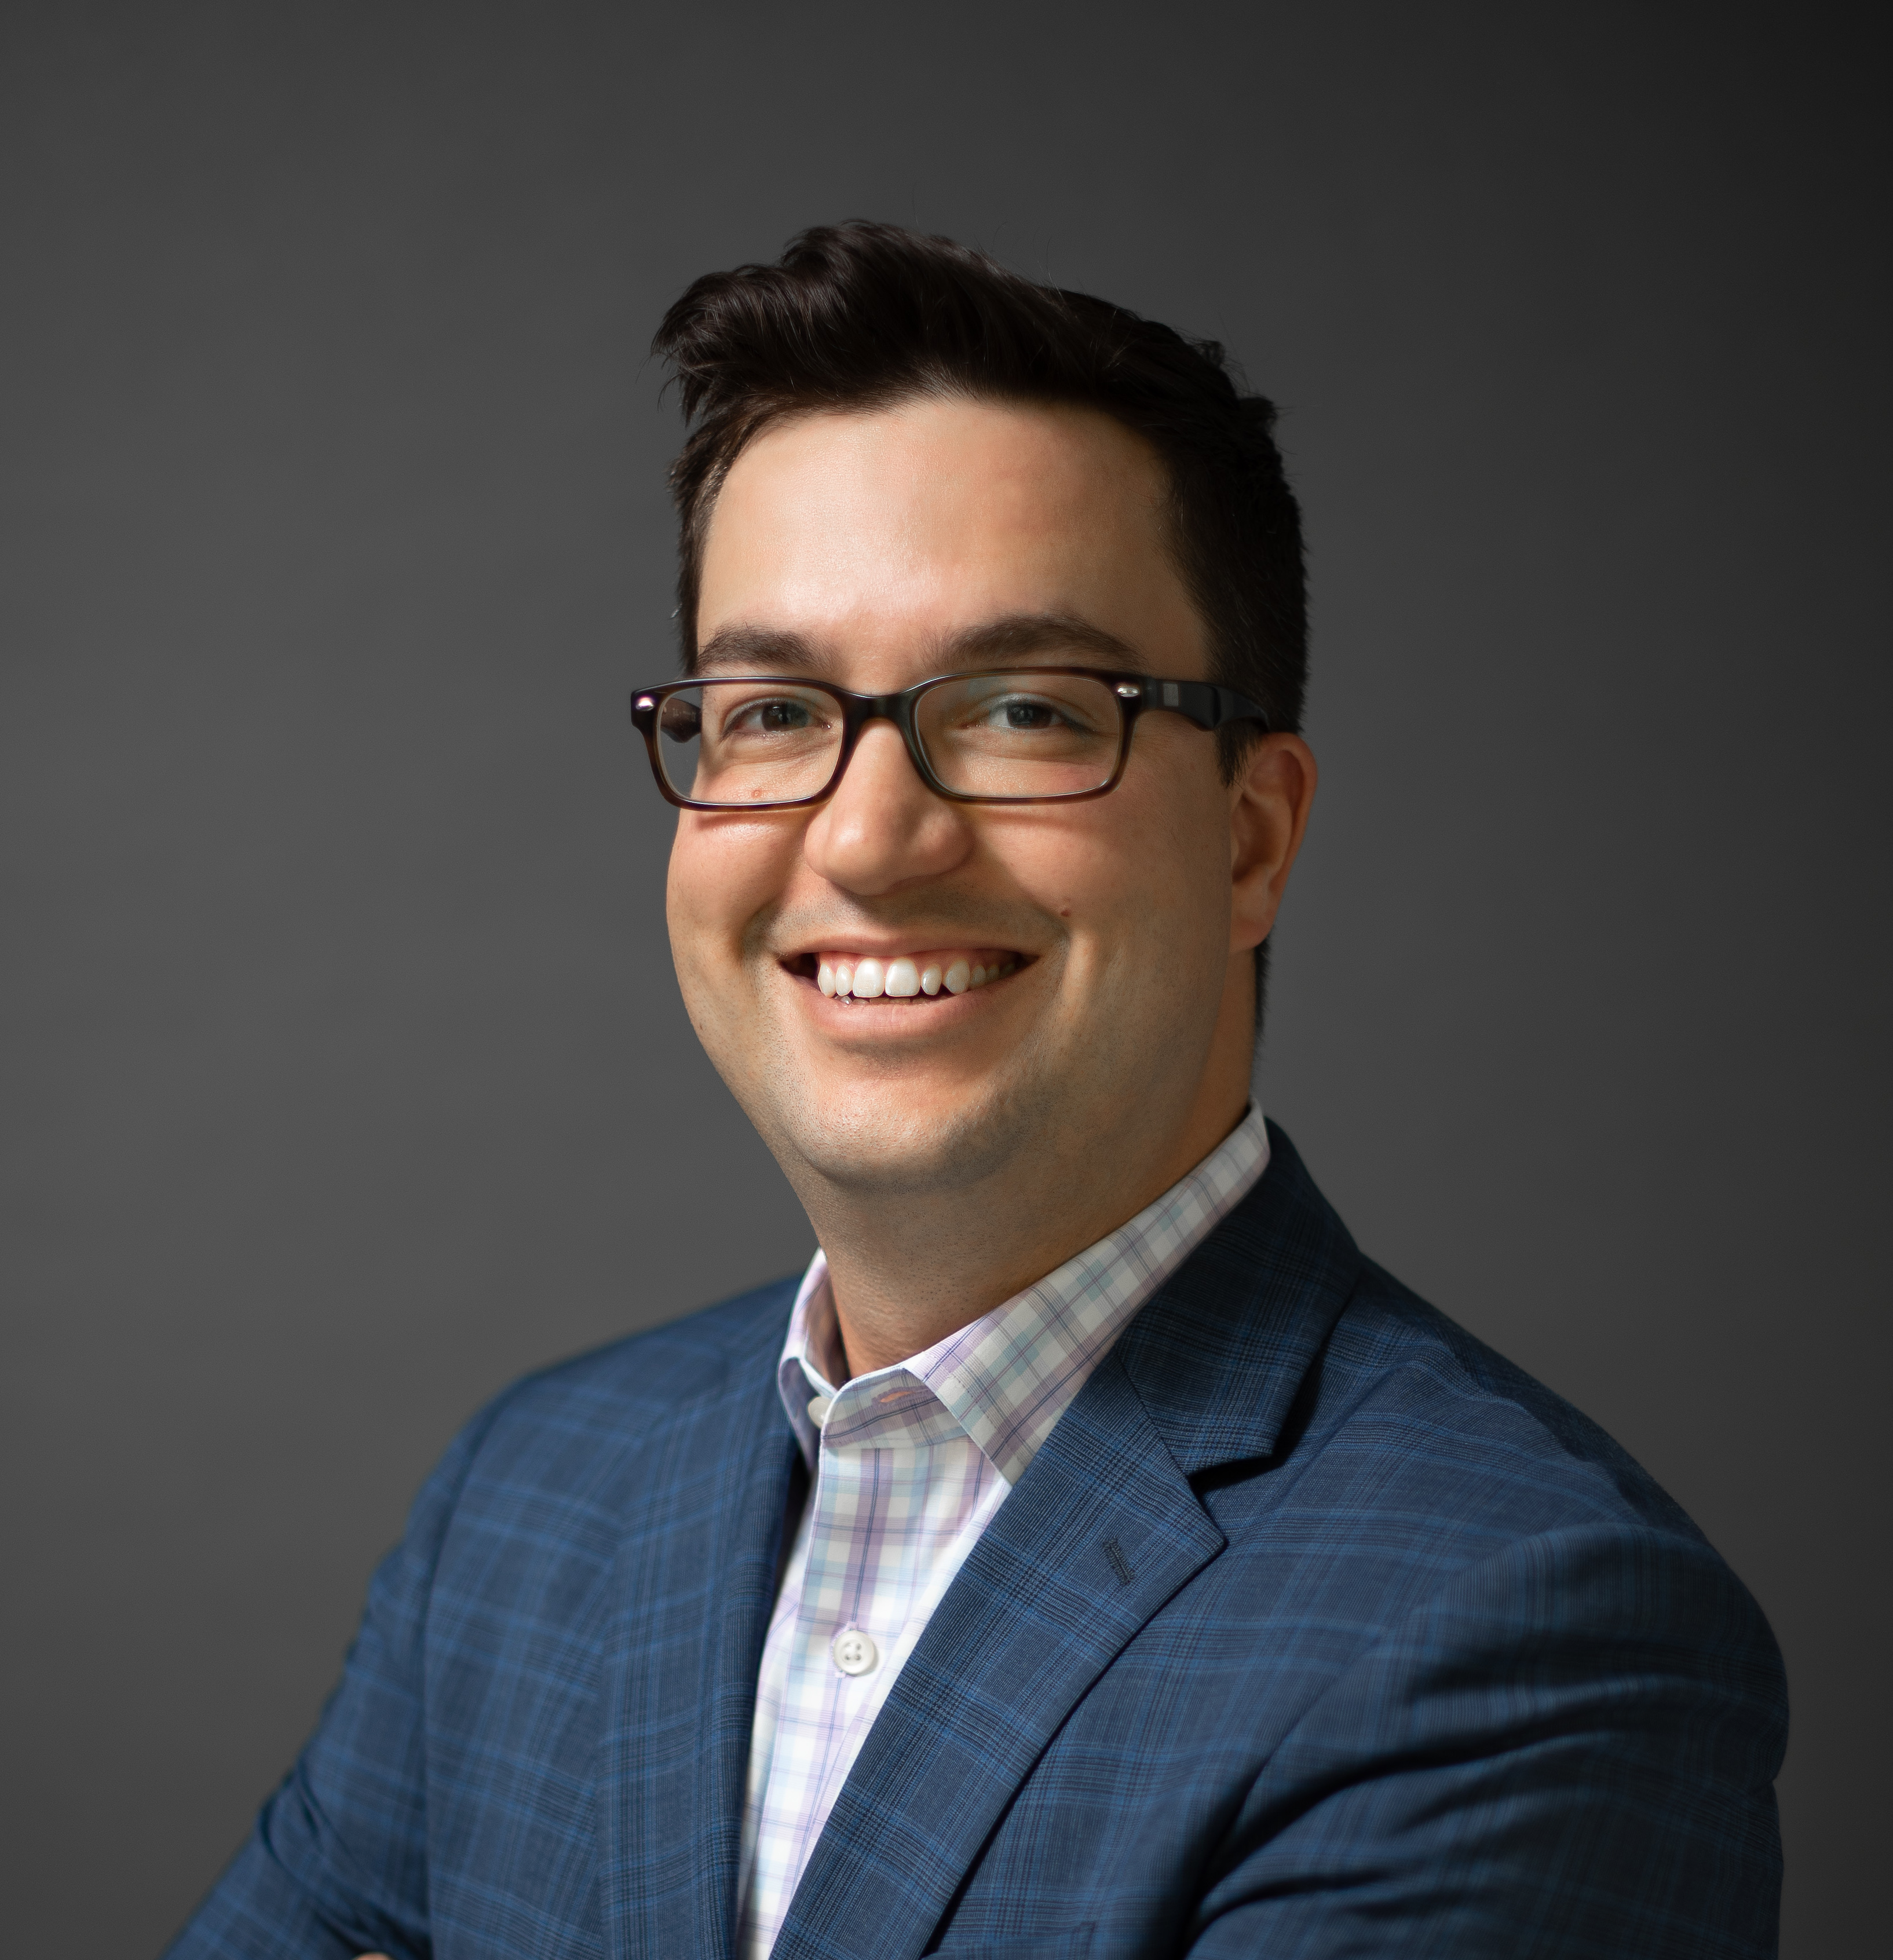 Daniel Duperrouzel - Senior Project Manager